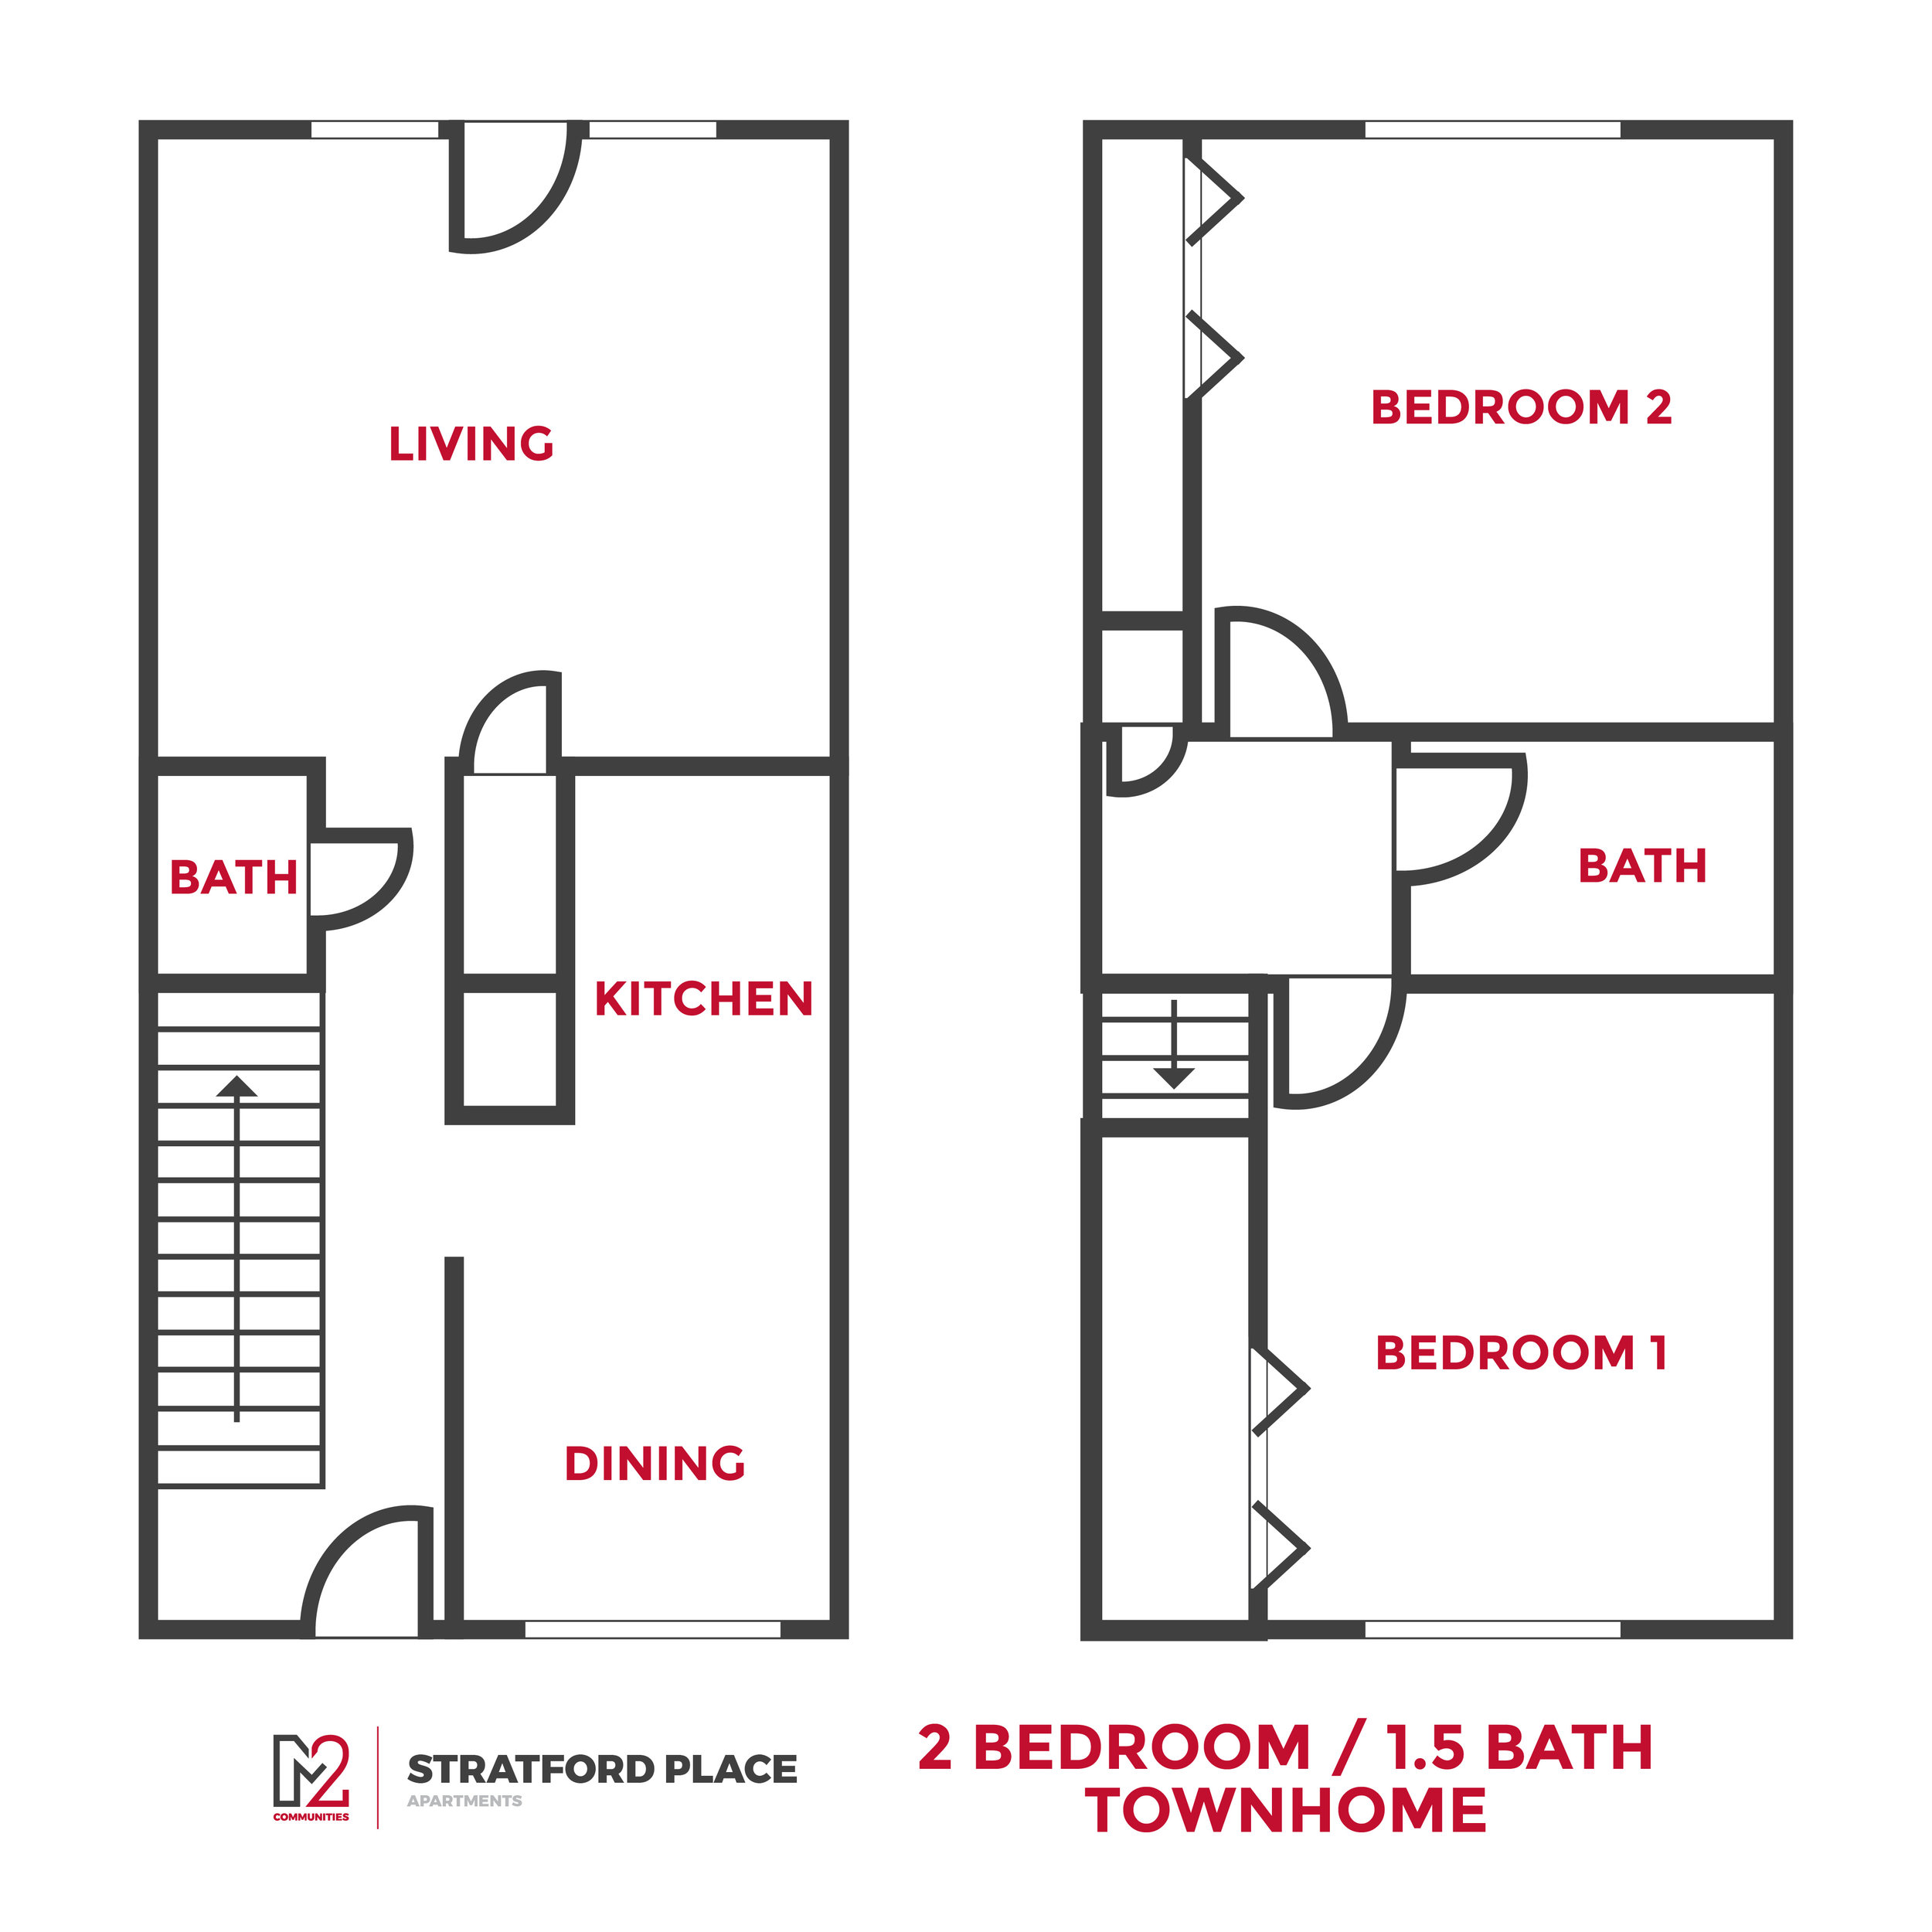 M2_Stratford_Floorplans-14.jpg